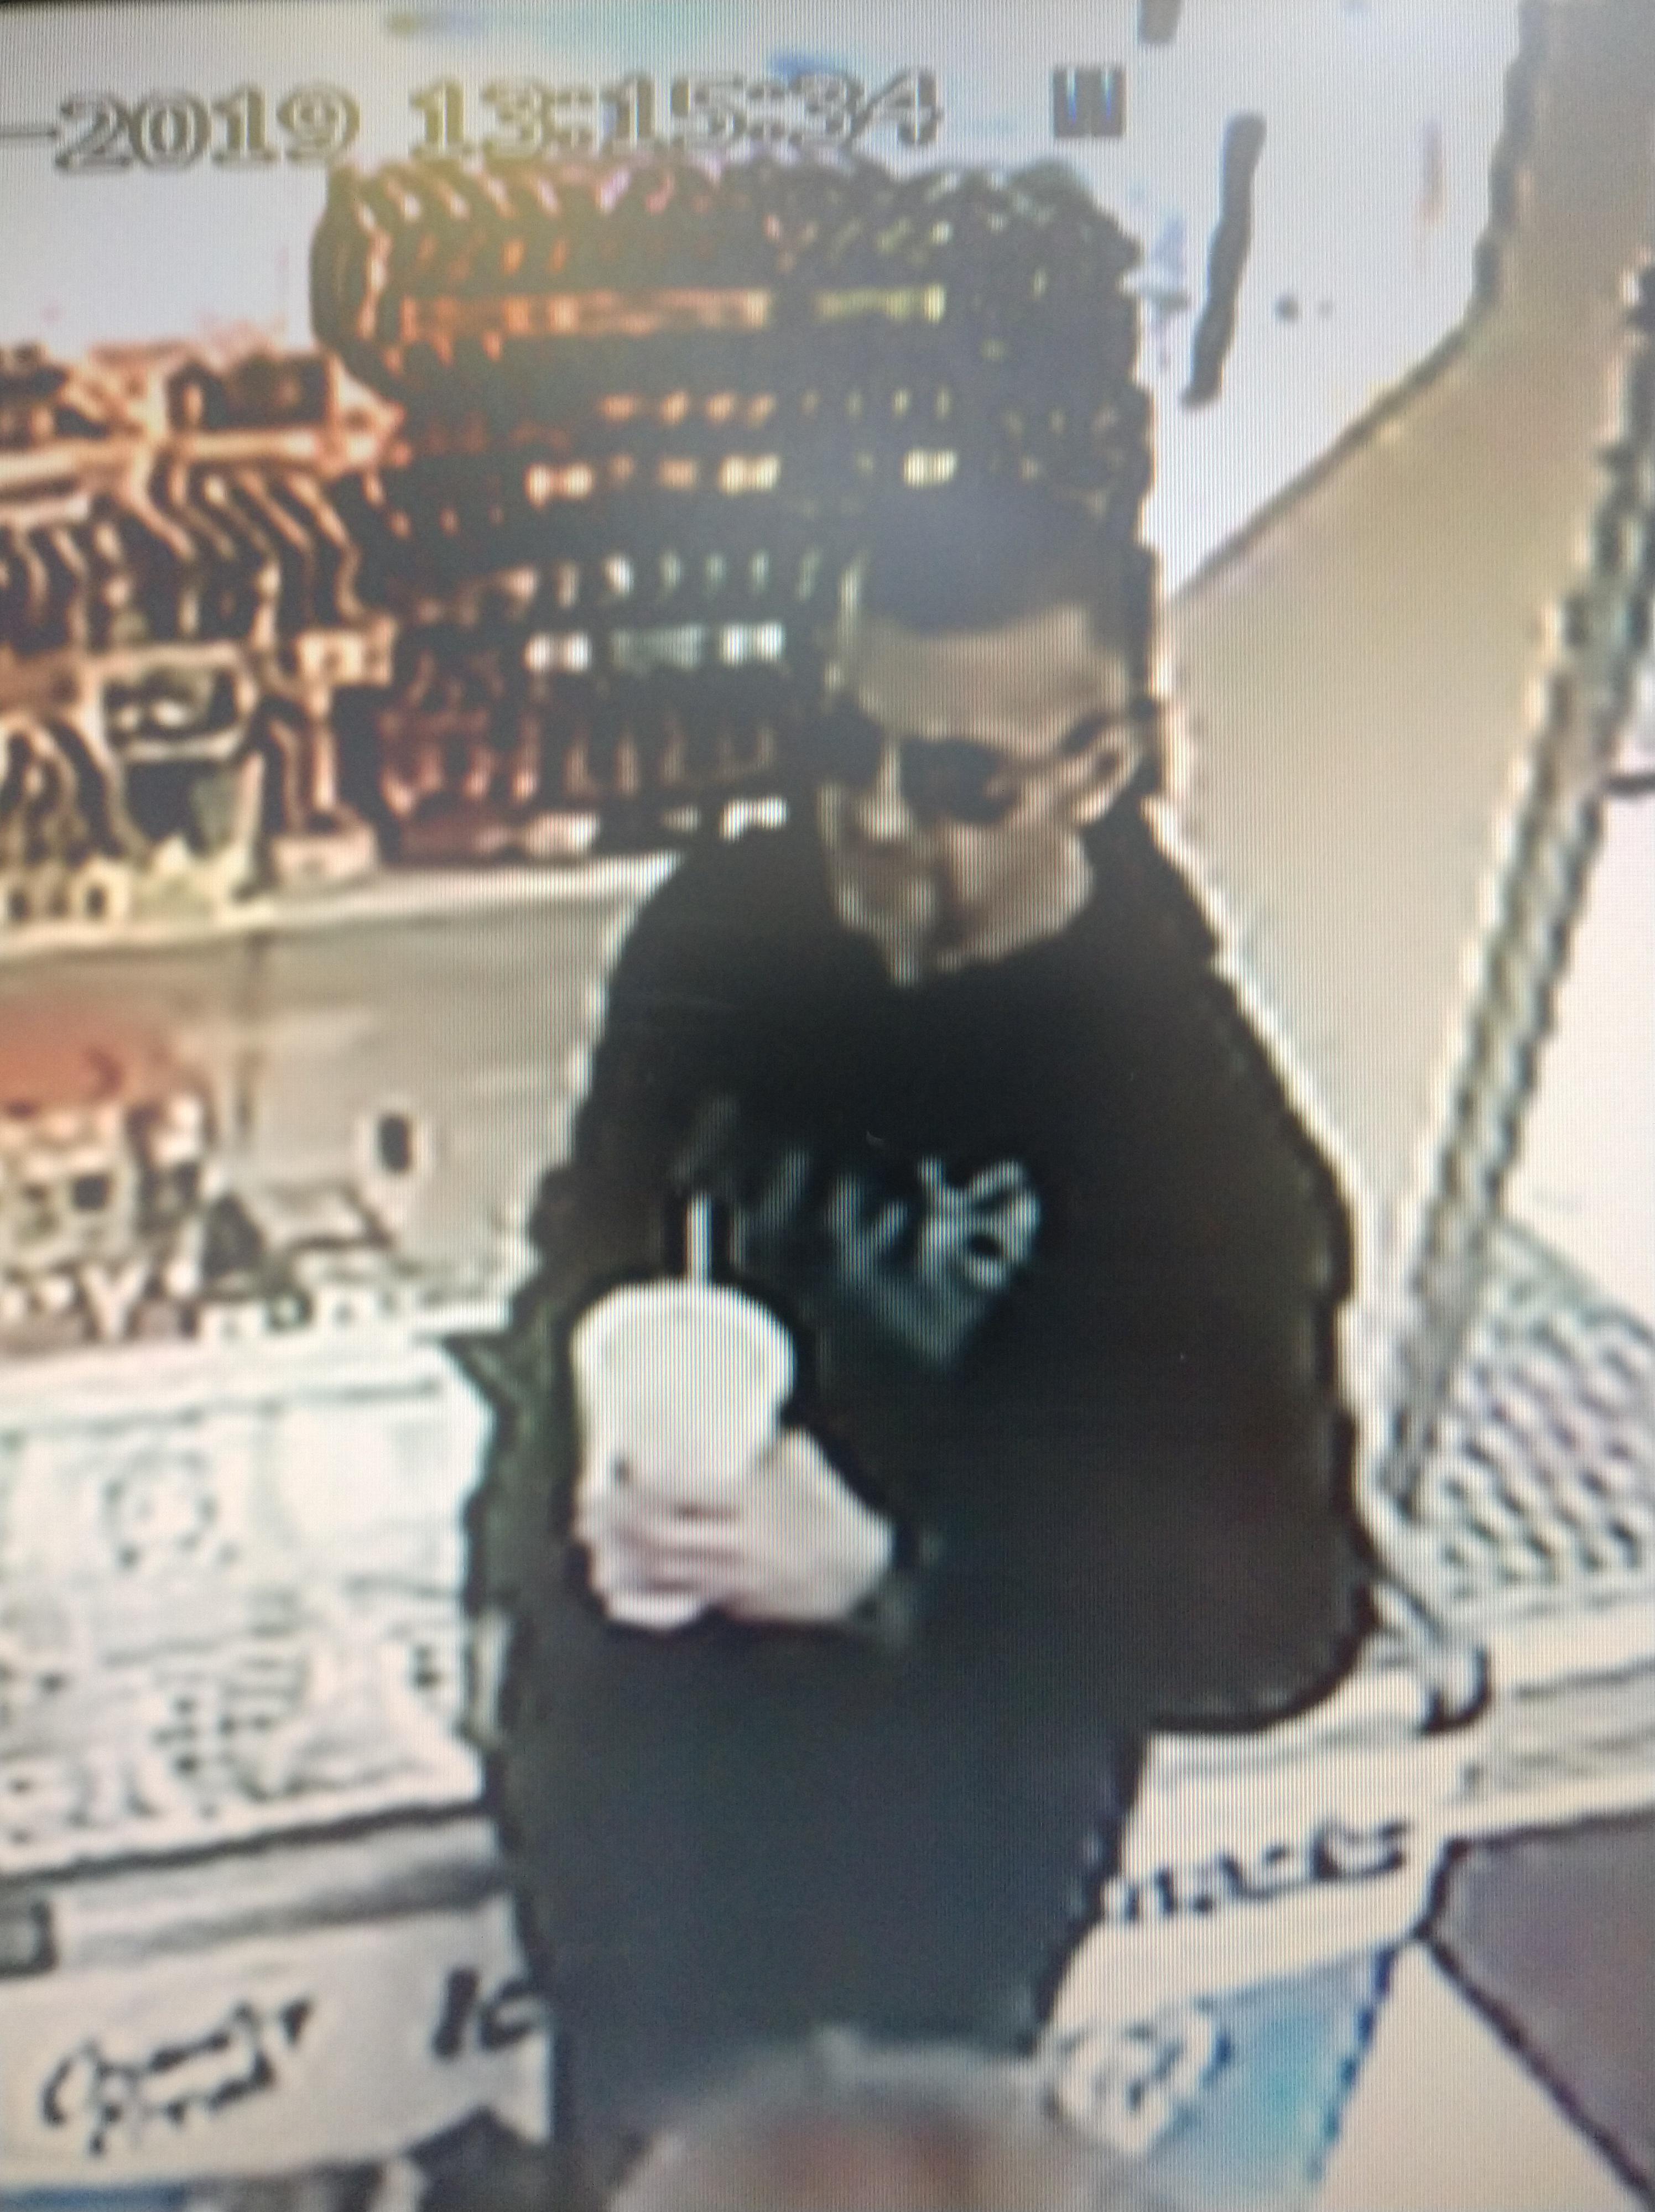 EZ Mart suspect image November 2019